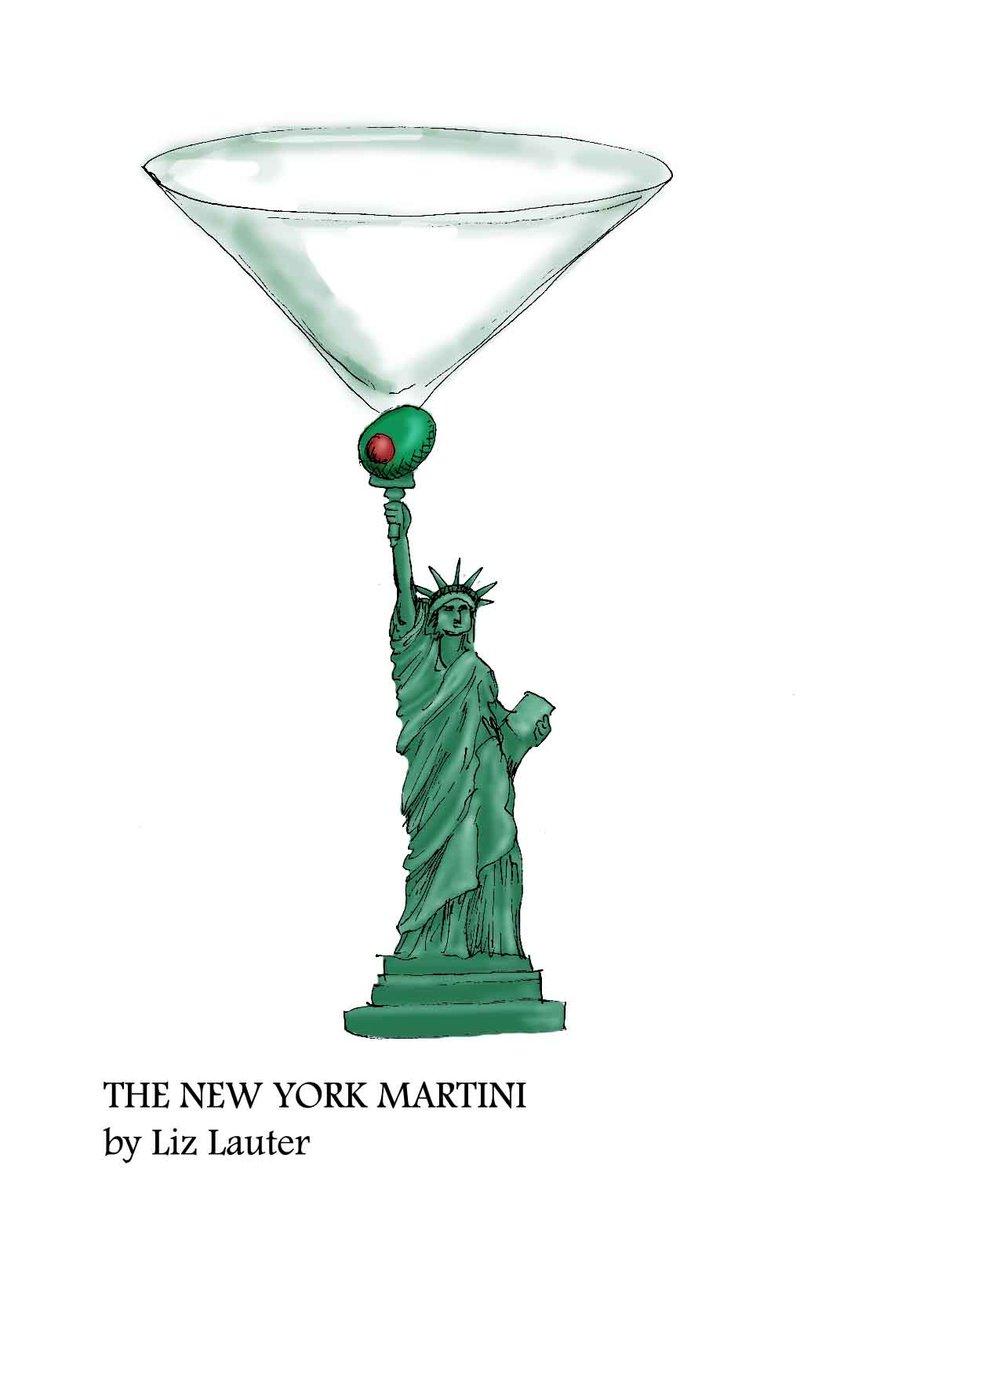 new york martini flat.jpg